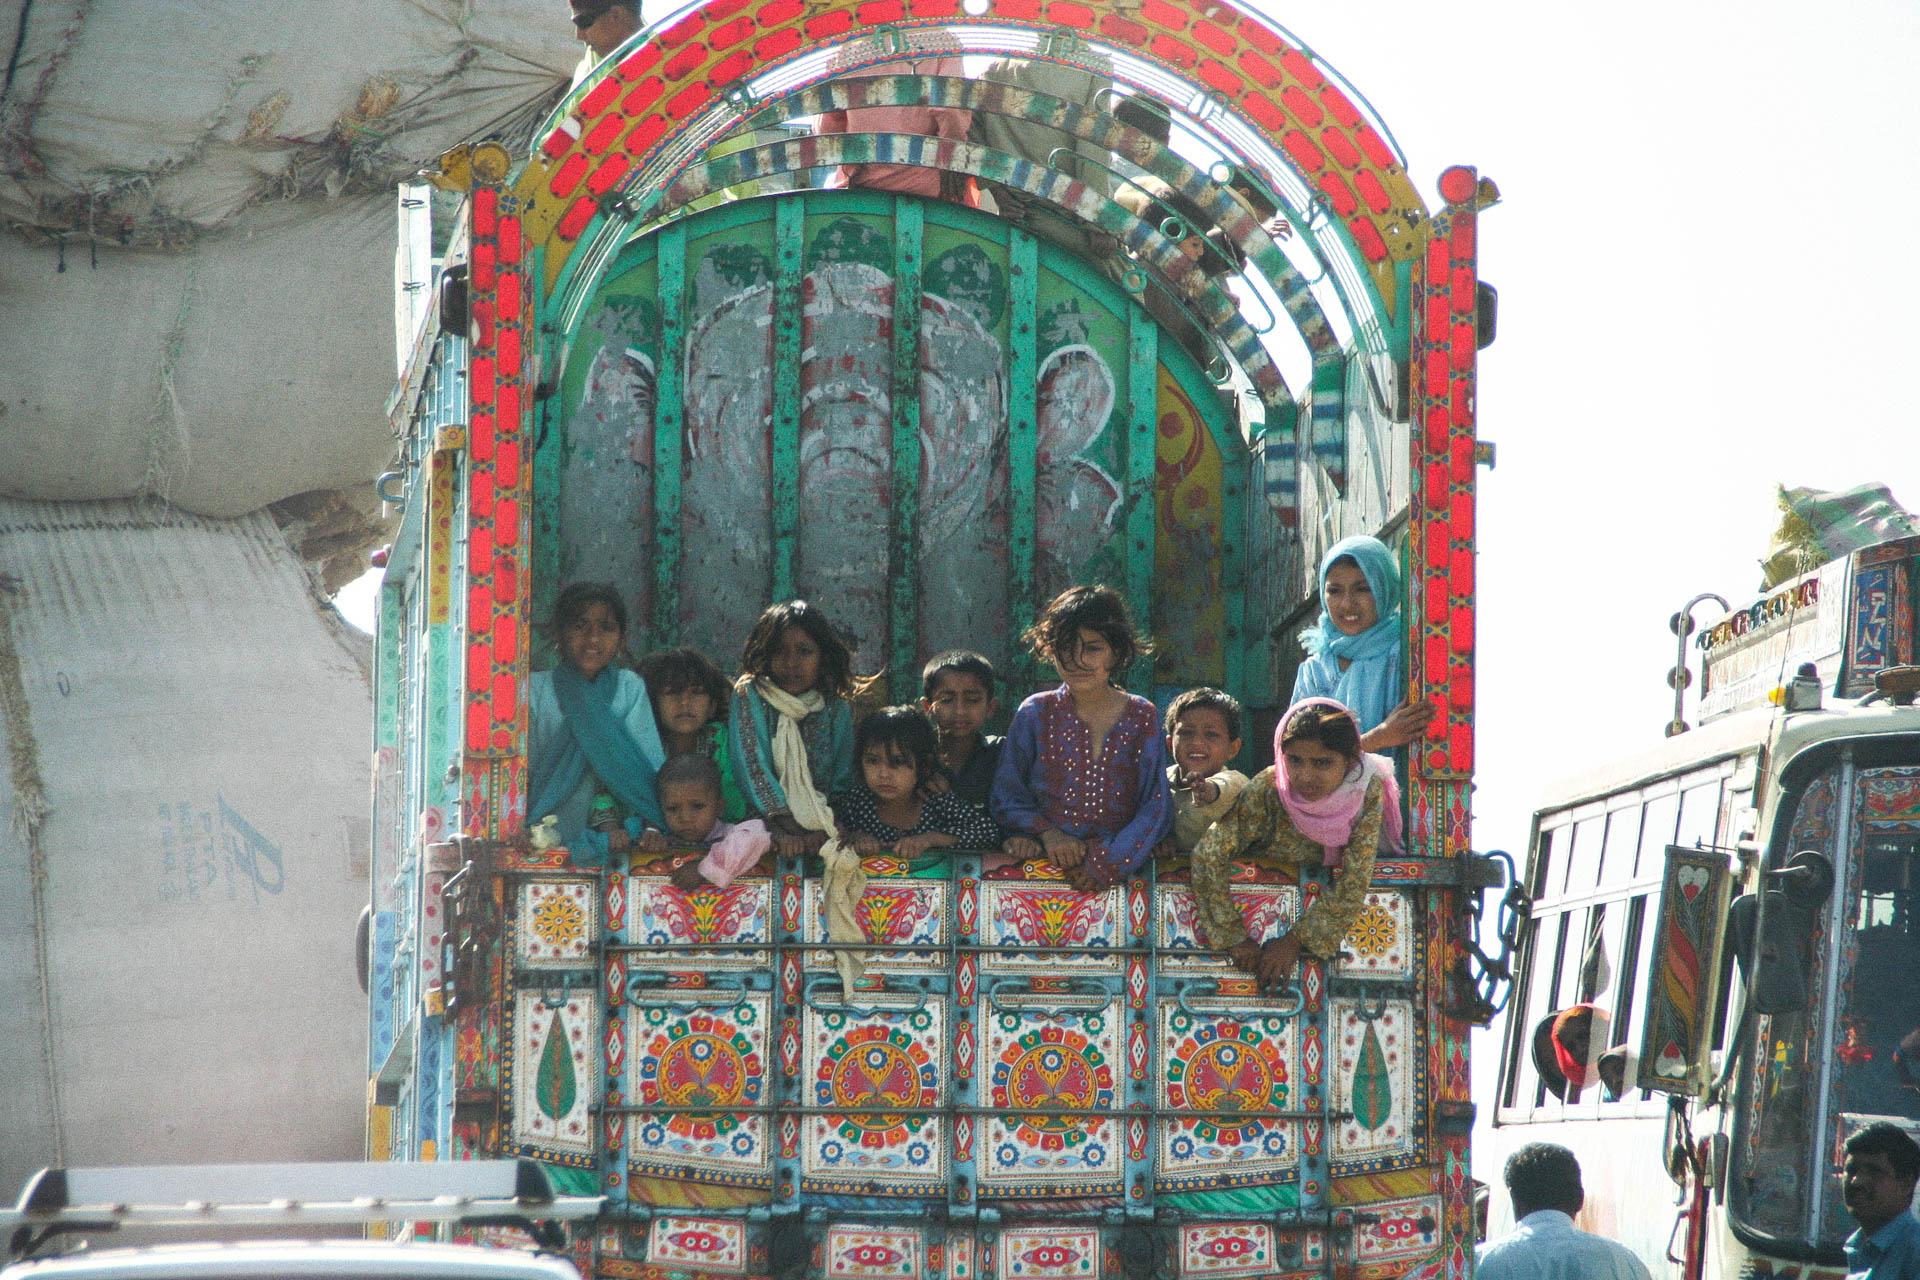 Kinder, Transport auf LKW